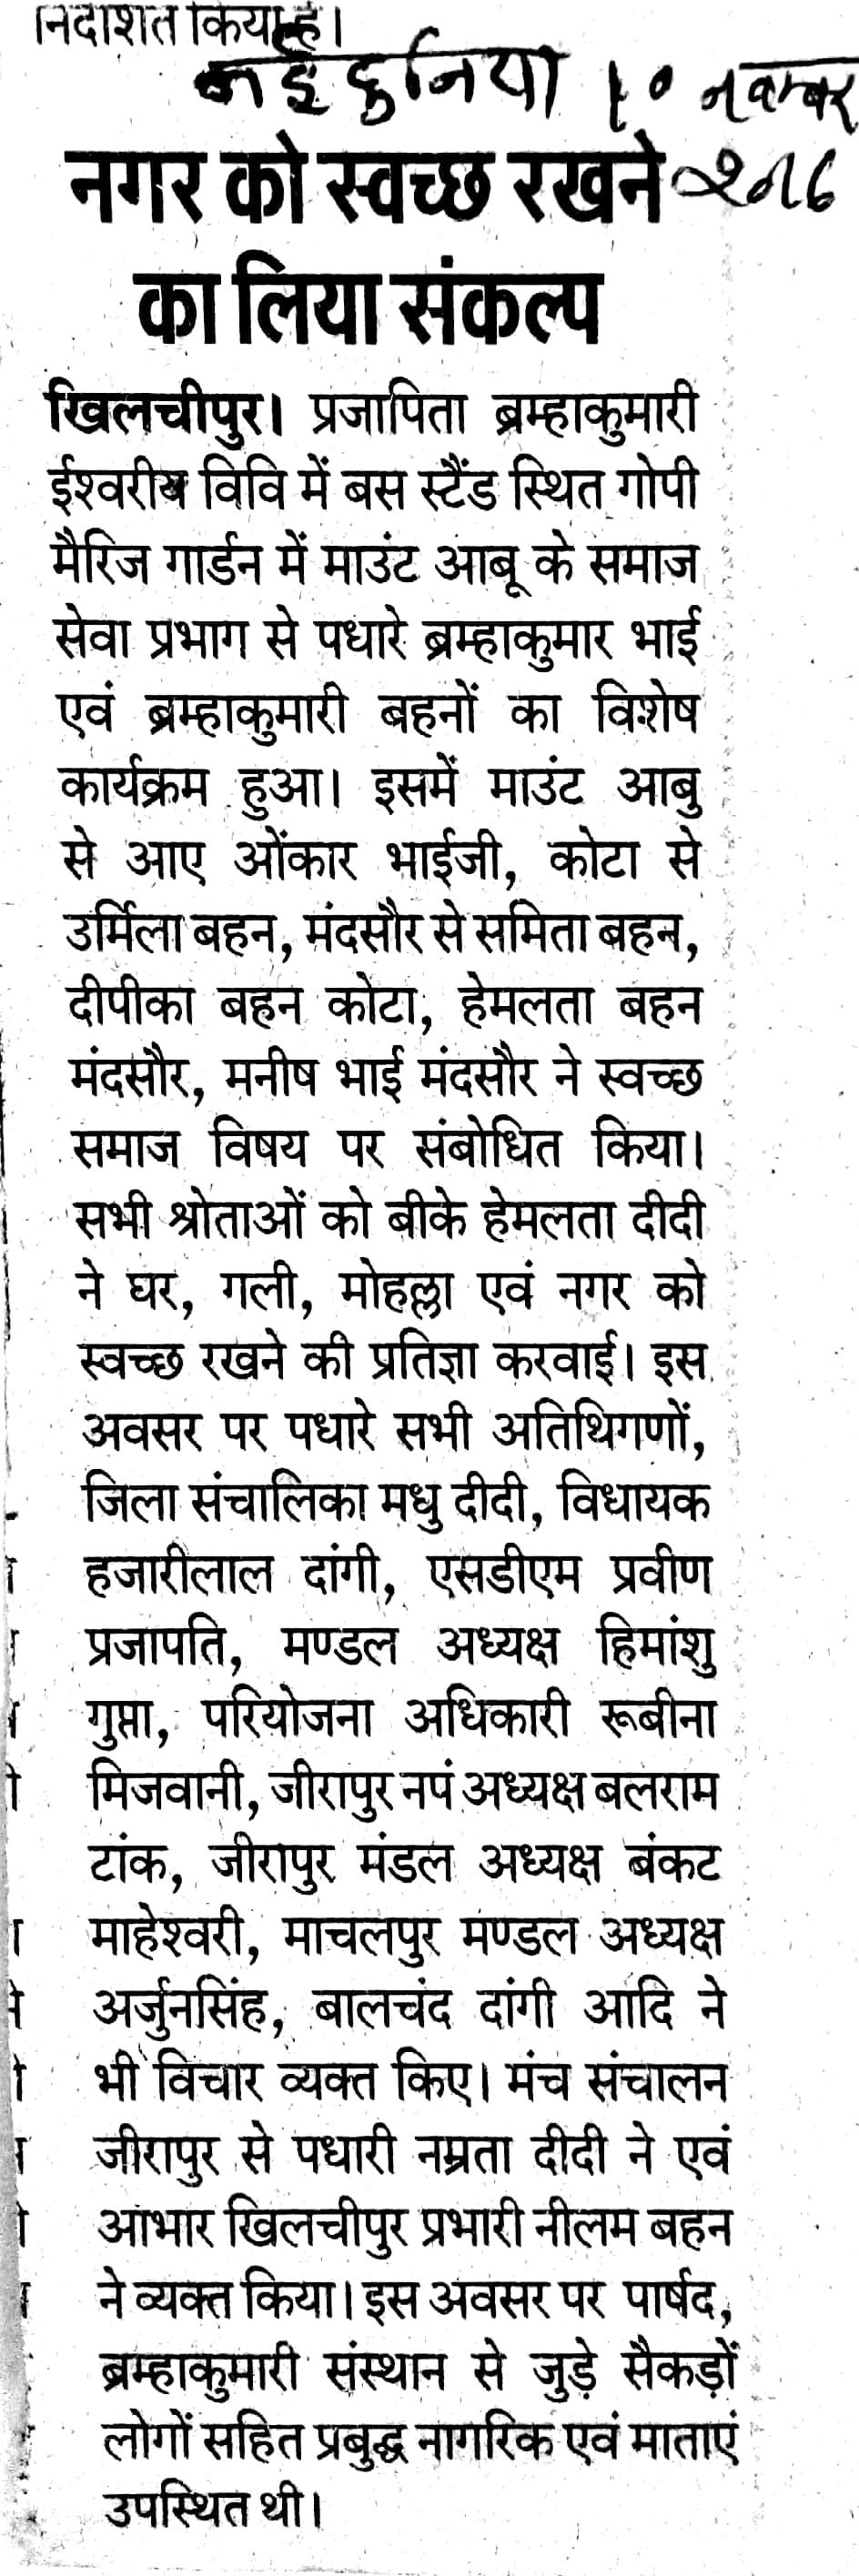 khilchipur 2016_2